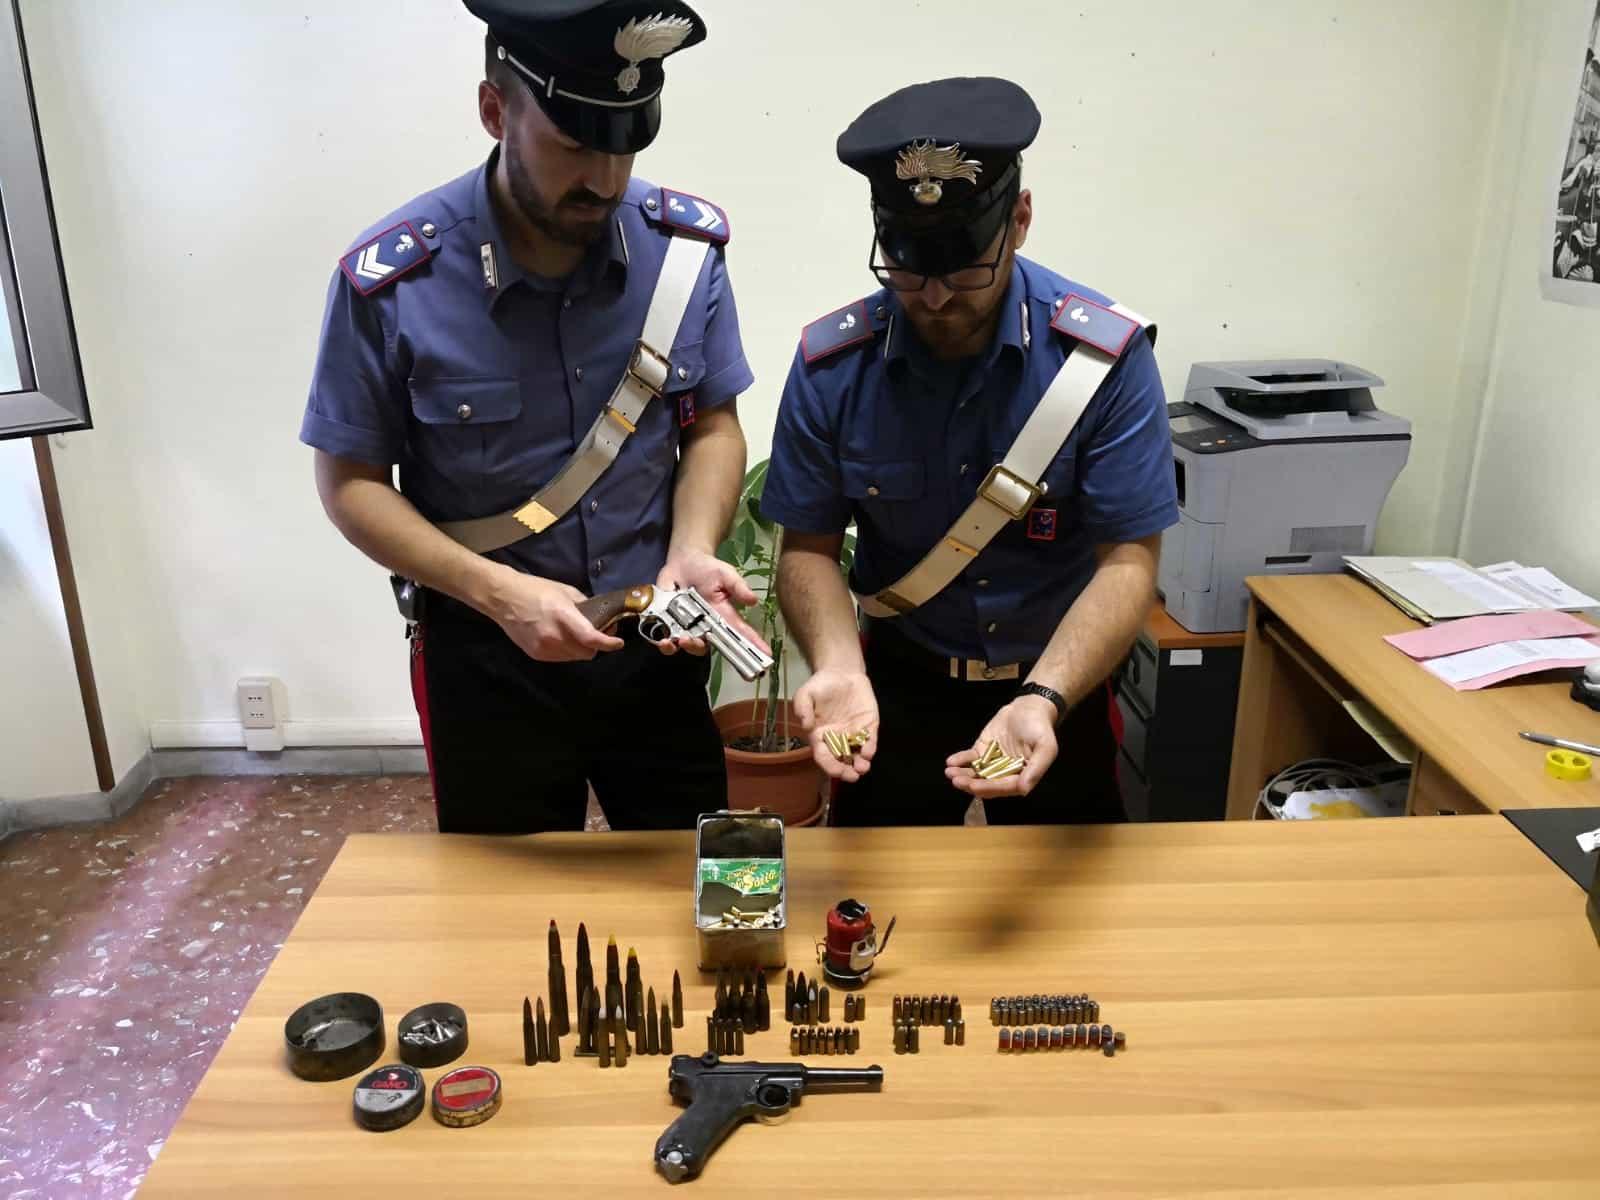 Le armi sequestrate dai Carabinieri (2) (1)-2